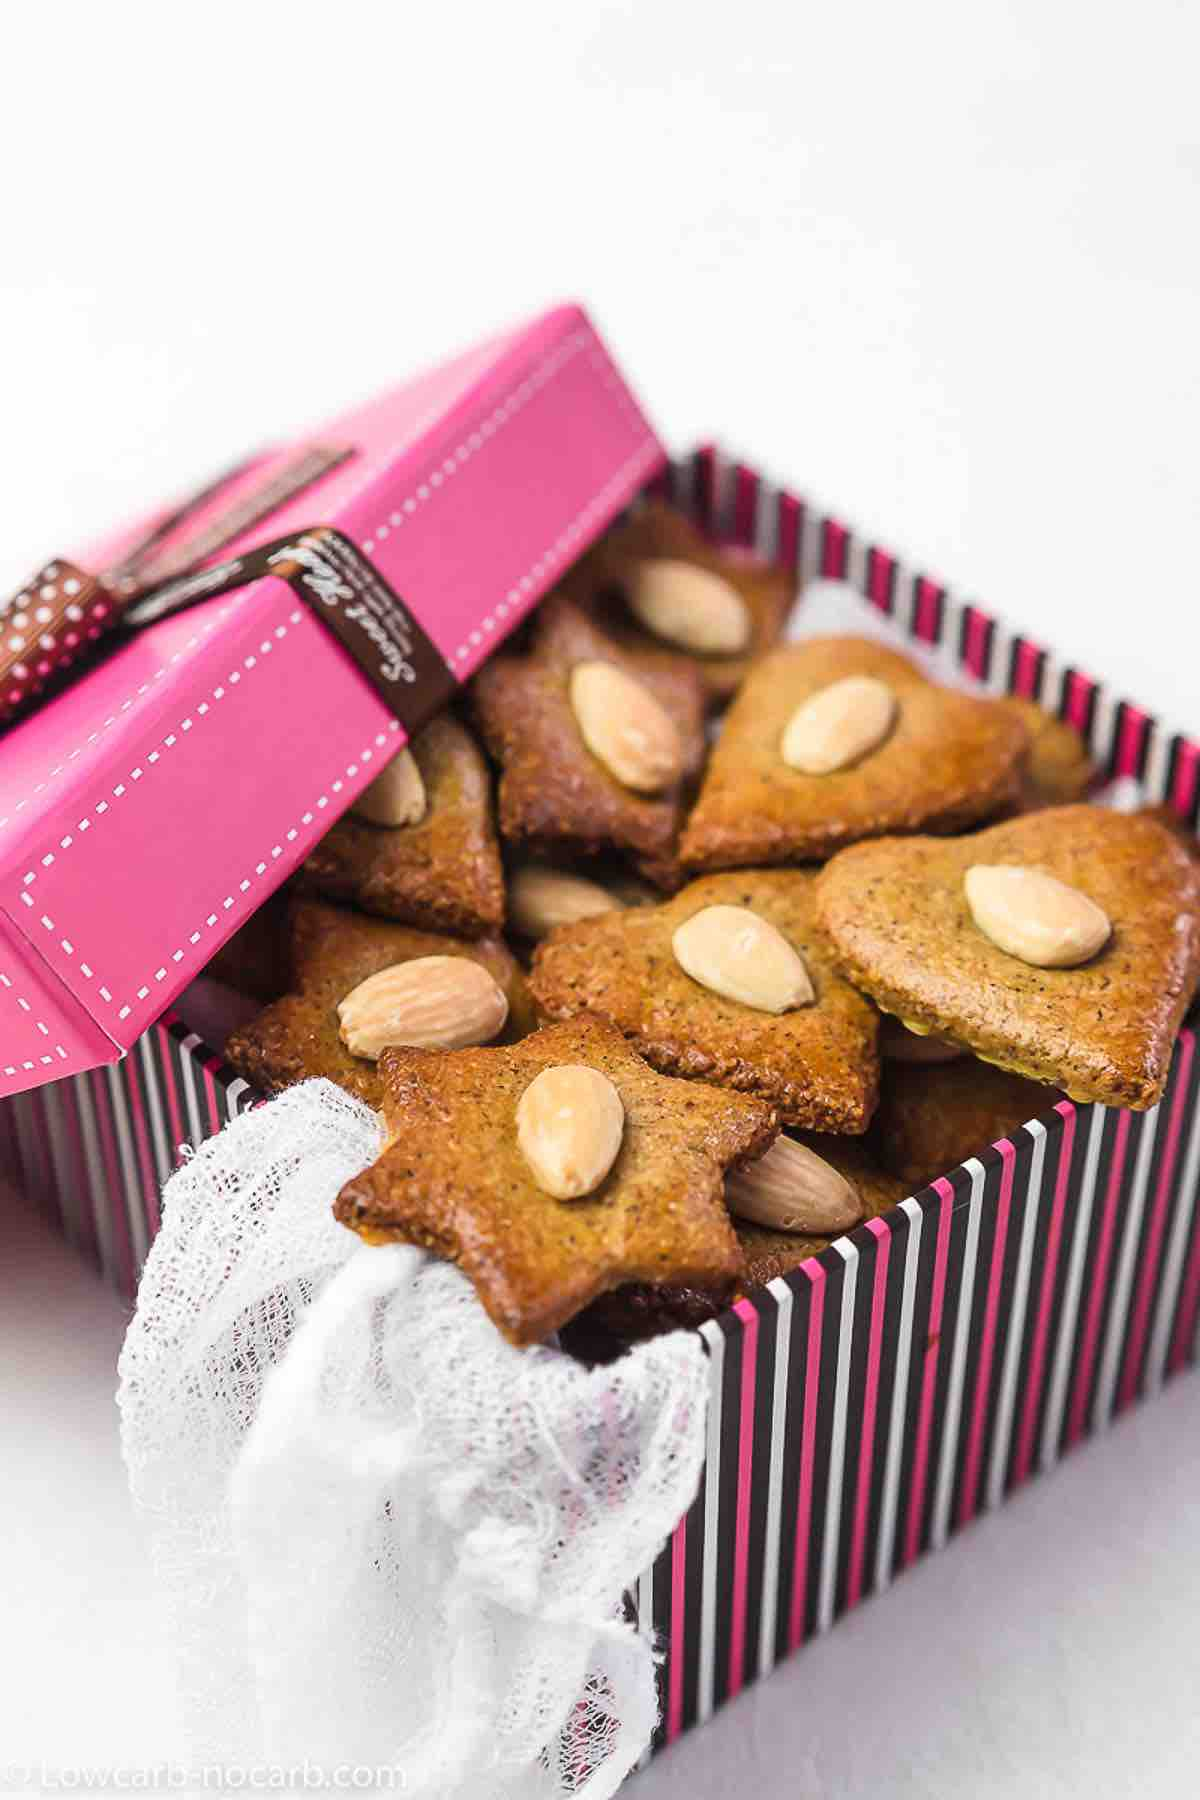 Valentines Sugar-Free Cookies in a pink box